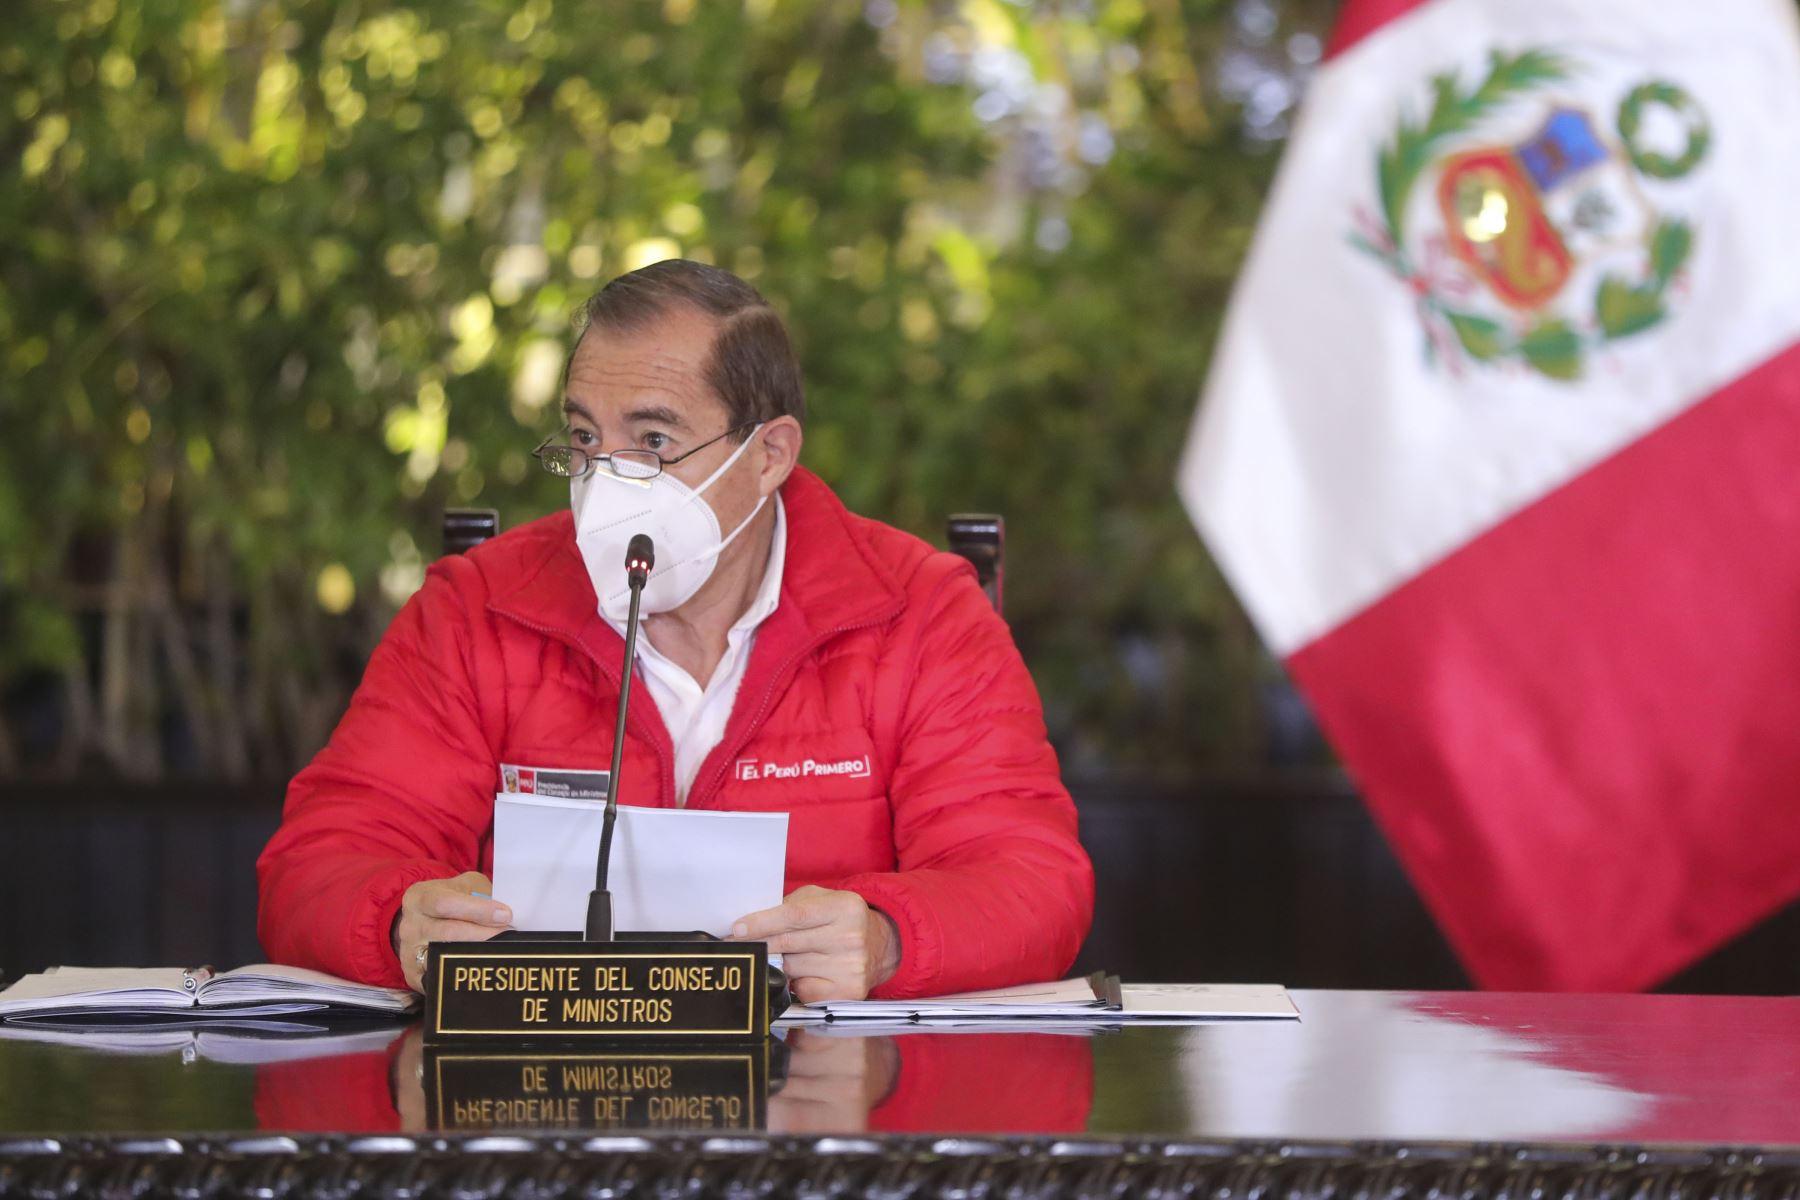 Ministro Walter Martos, presidente de Consejo de Ministros, instalan la Comisión de Alto Nivel de Cambio Climático. Foto: ANDINA/Prensa Presidencia